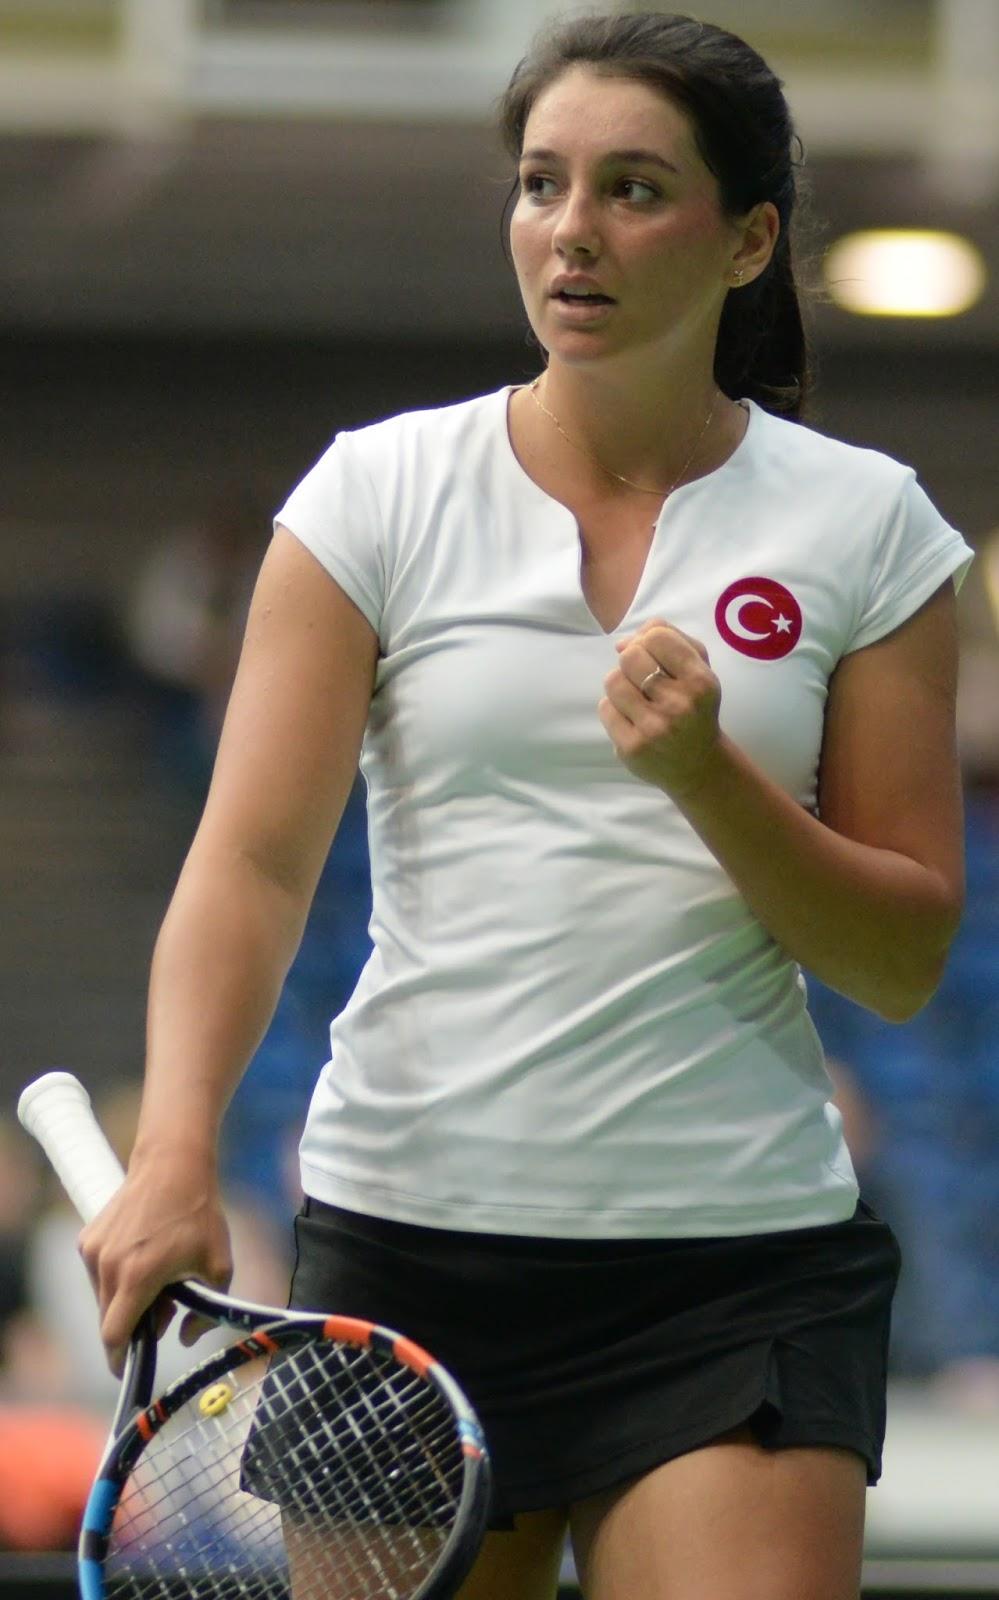 WTA Hotties: 2015 Hot-100: #36 Ipek Soylu (@soyluofficial